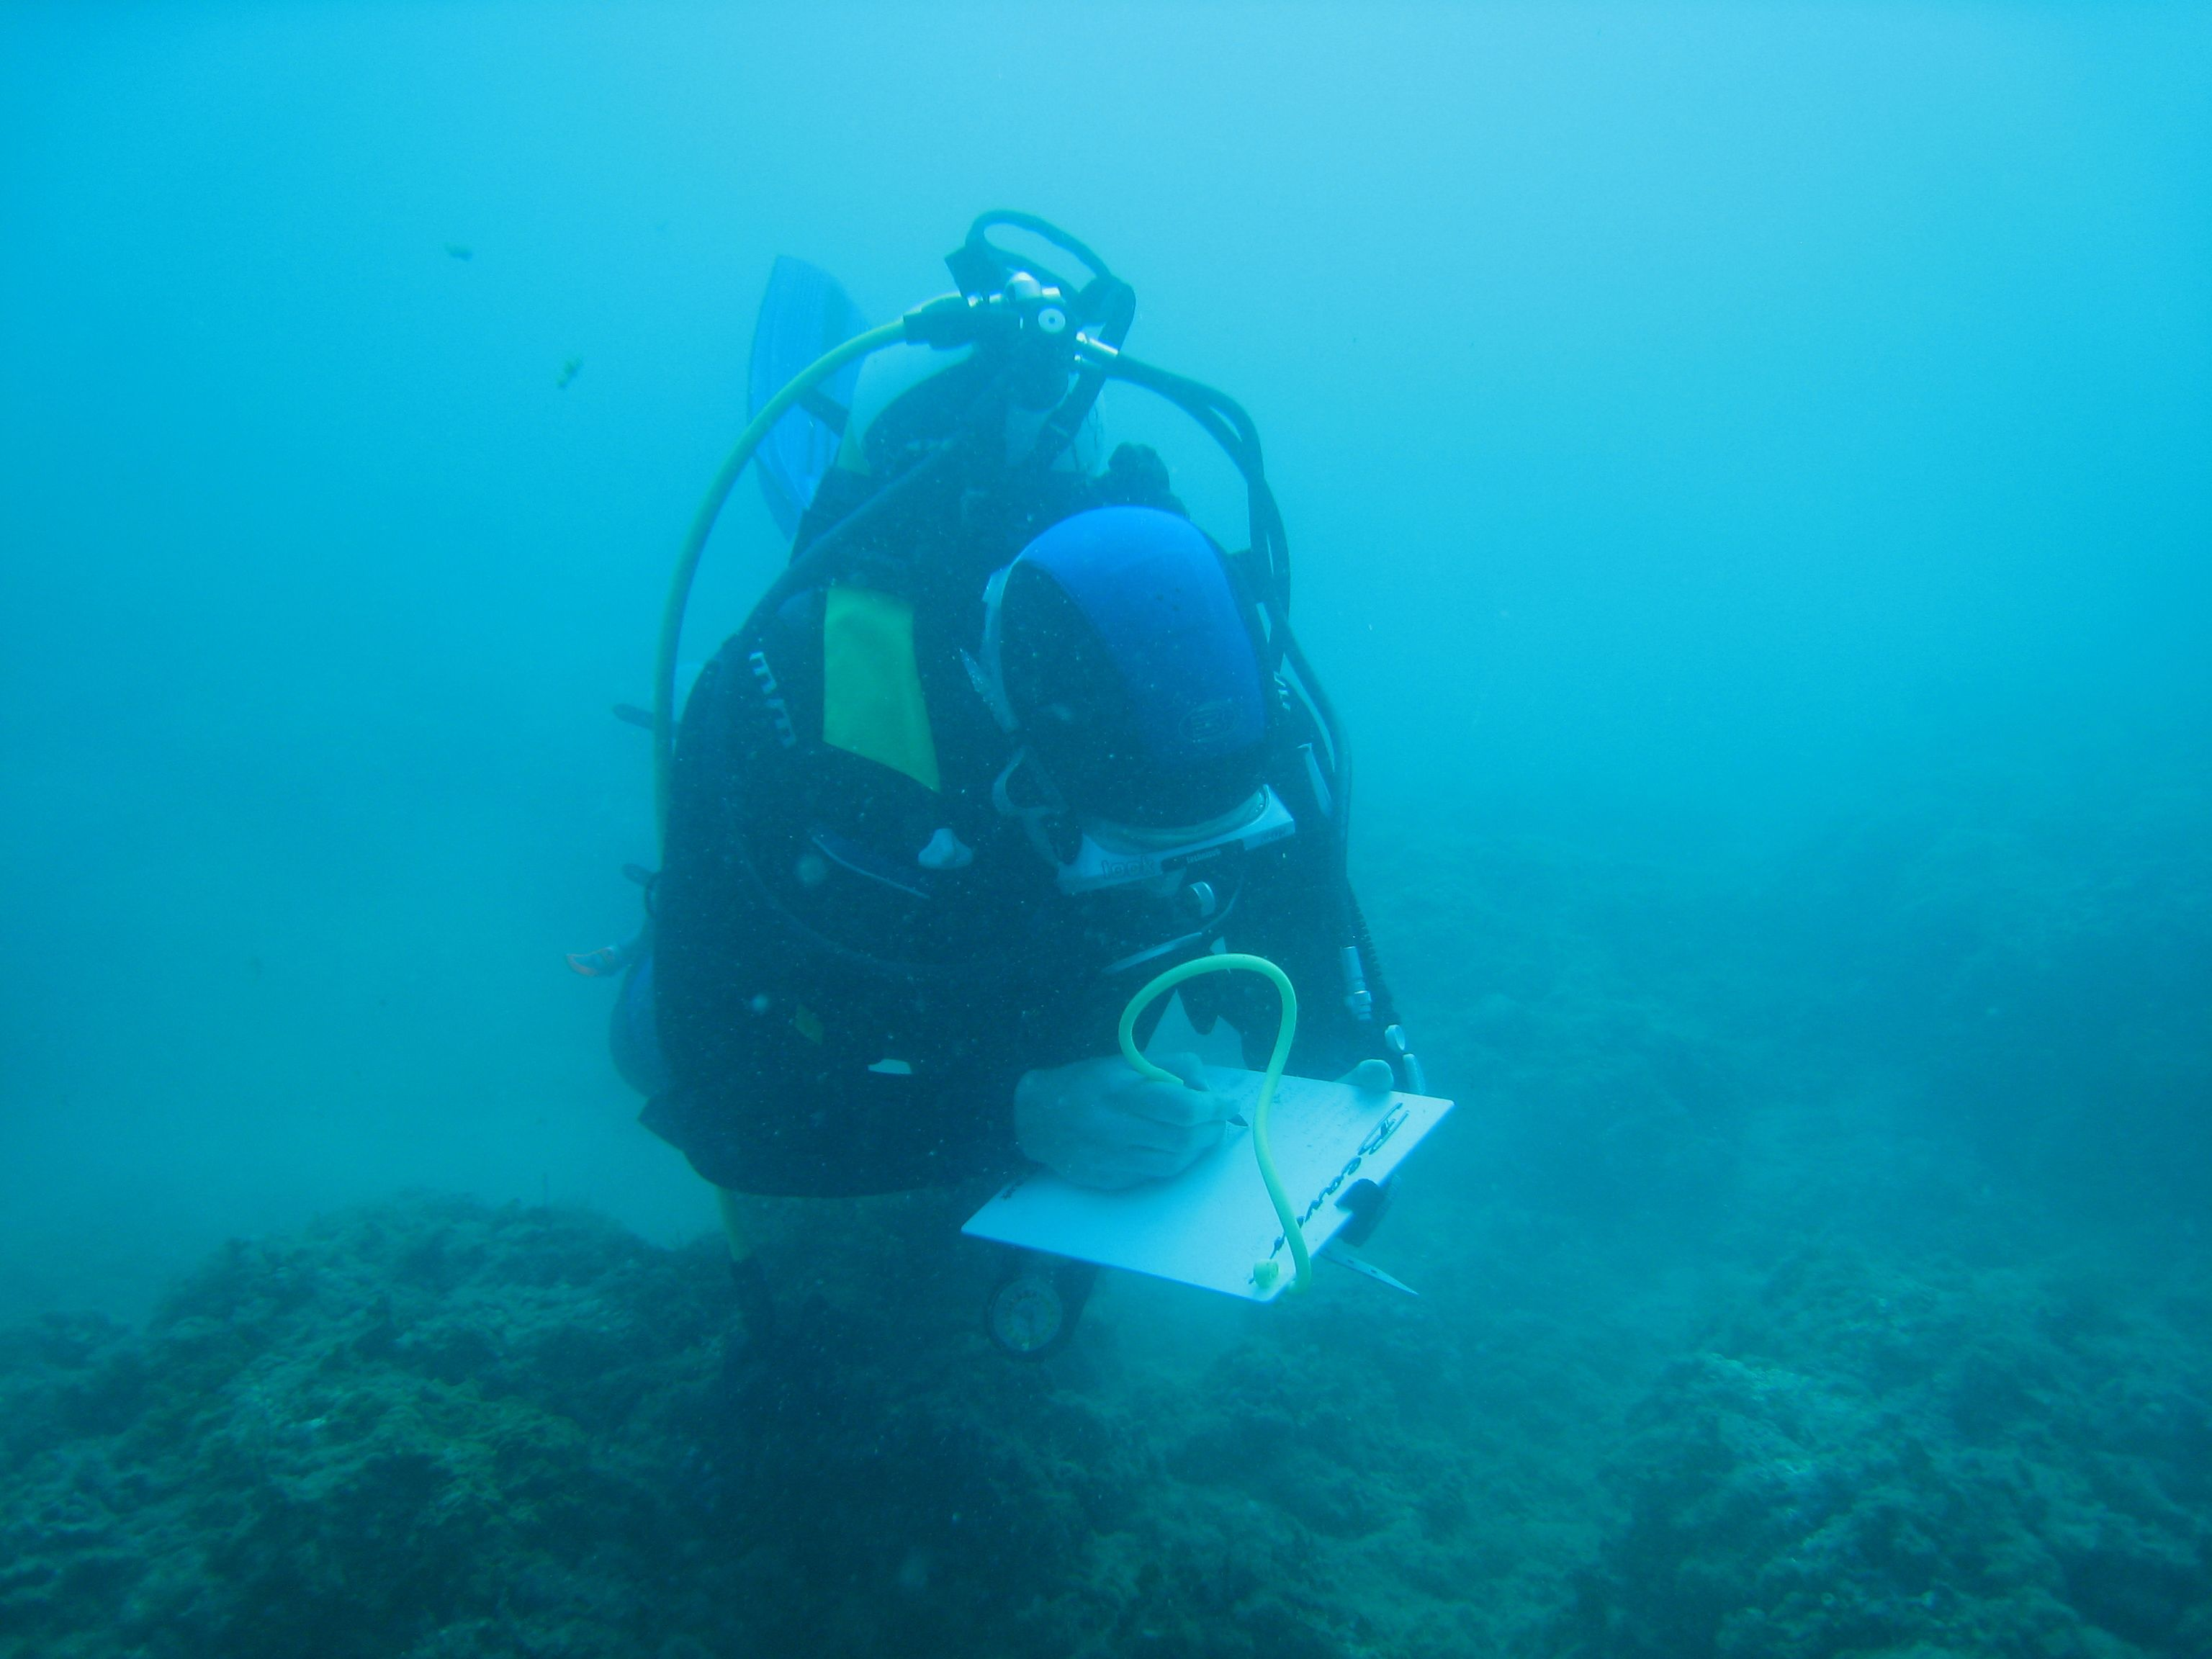 Eco Dive Volunteer Collecting Data On Key Species Diver Marine Conservation Volunteer Diving